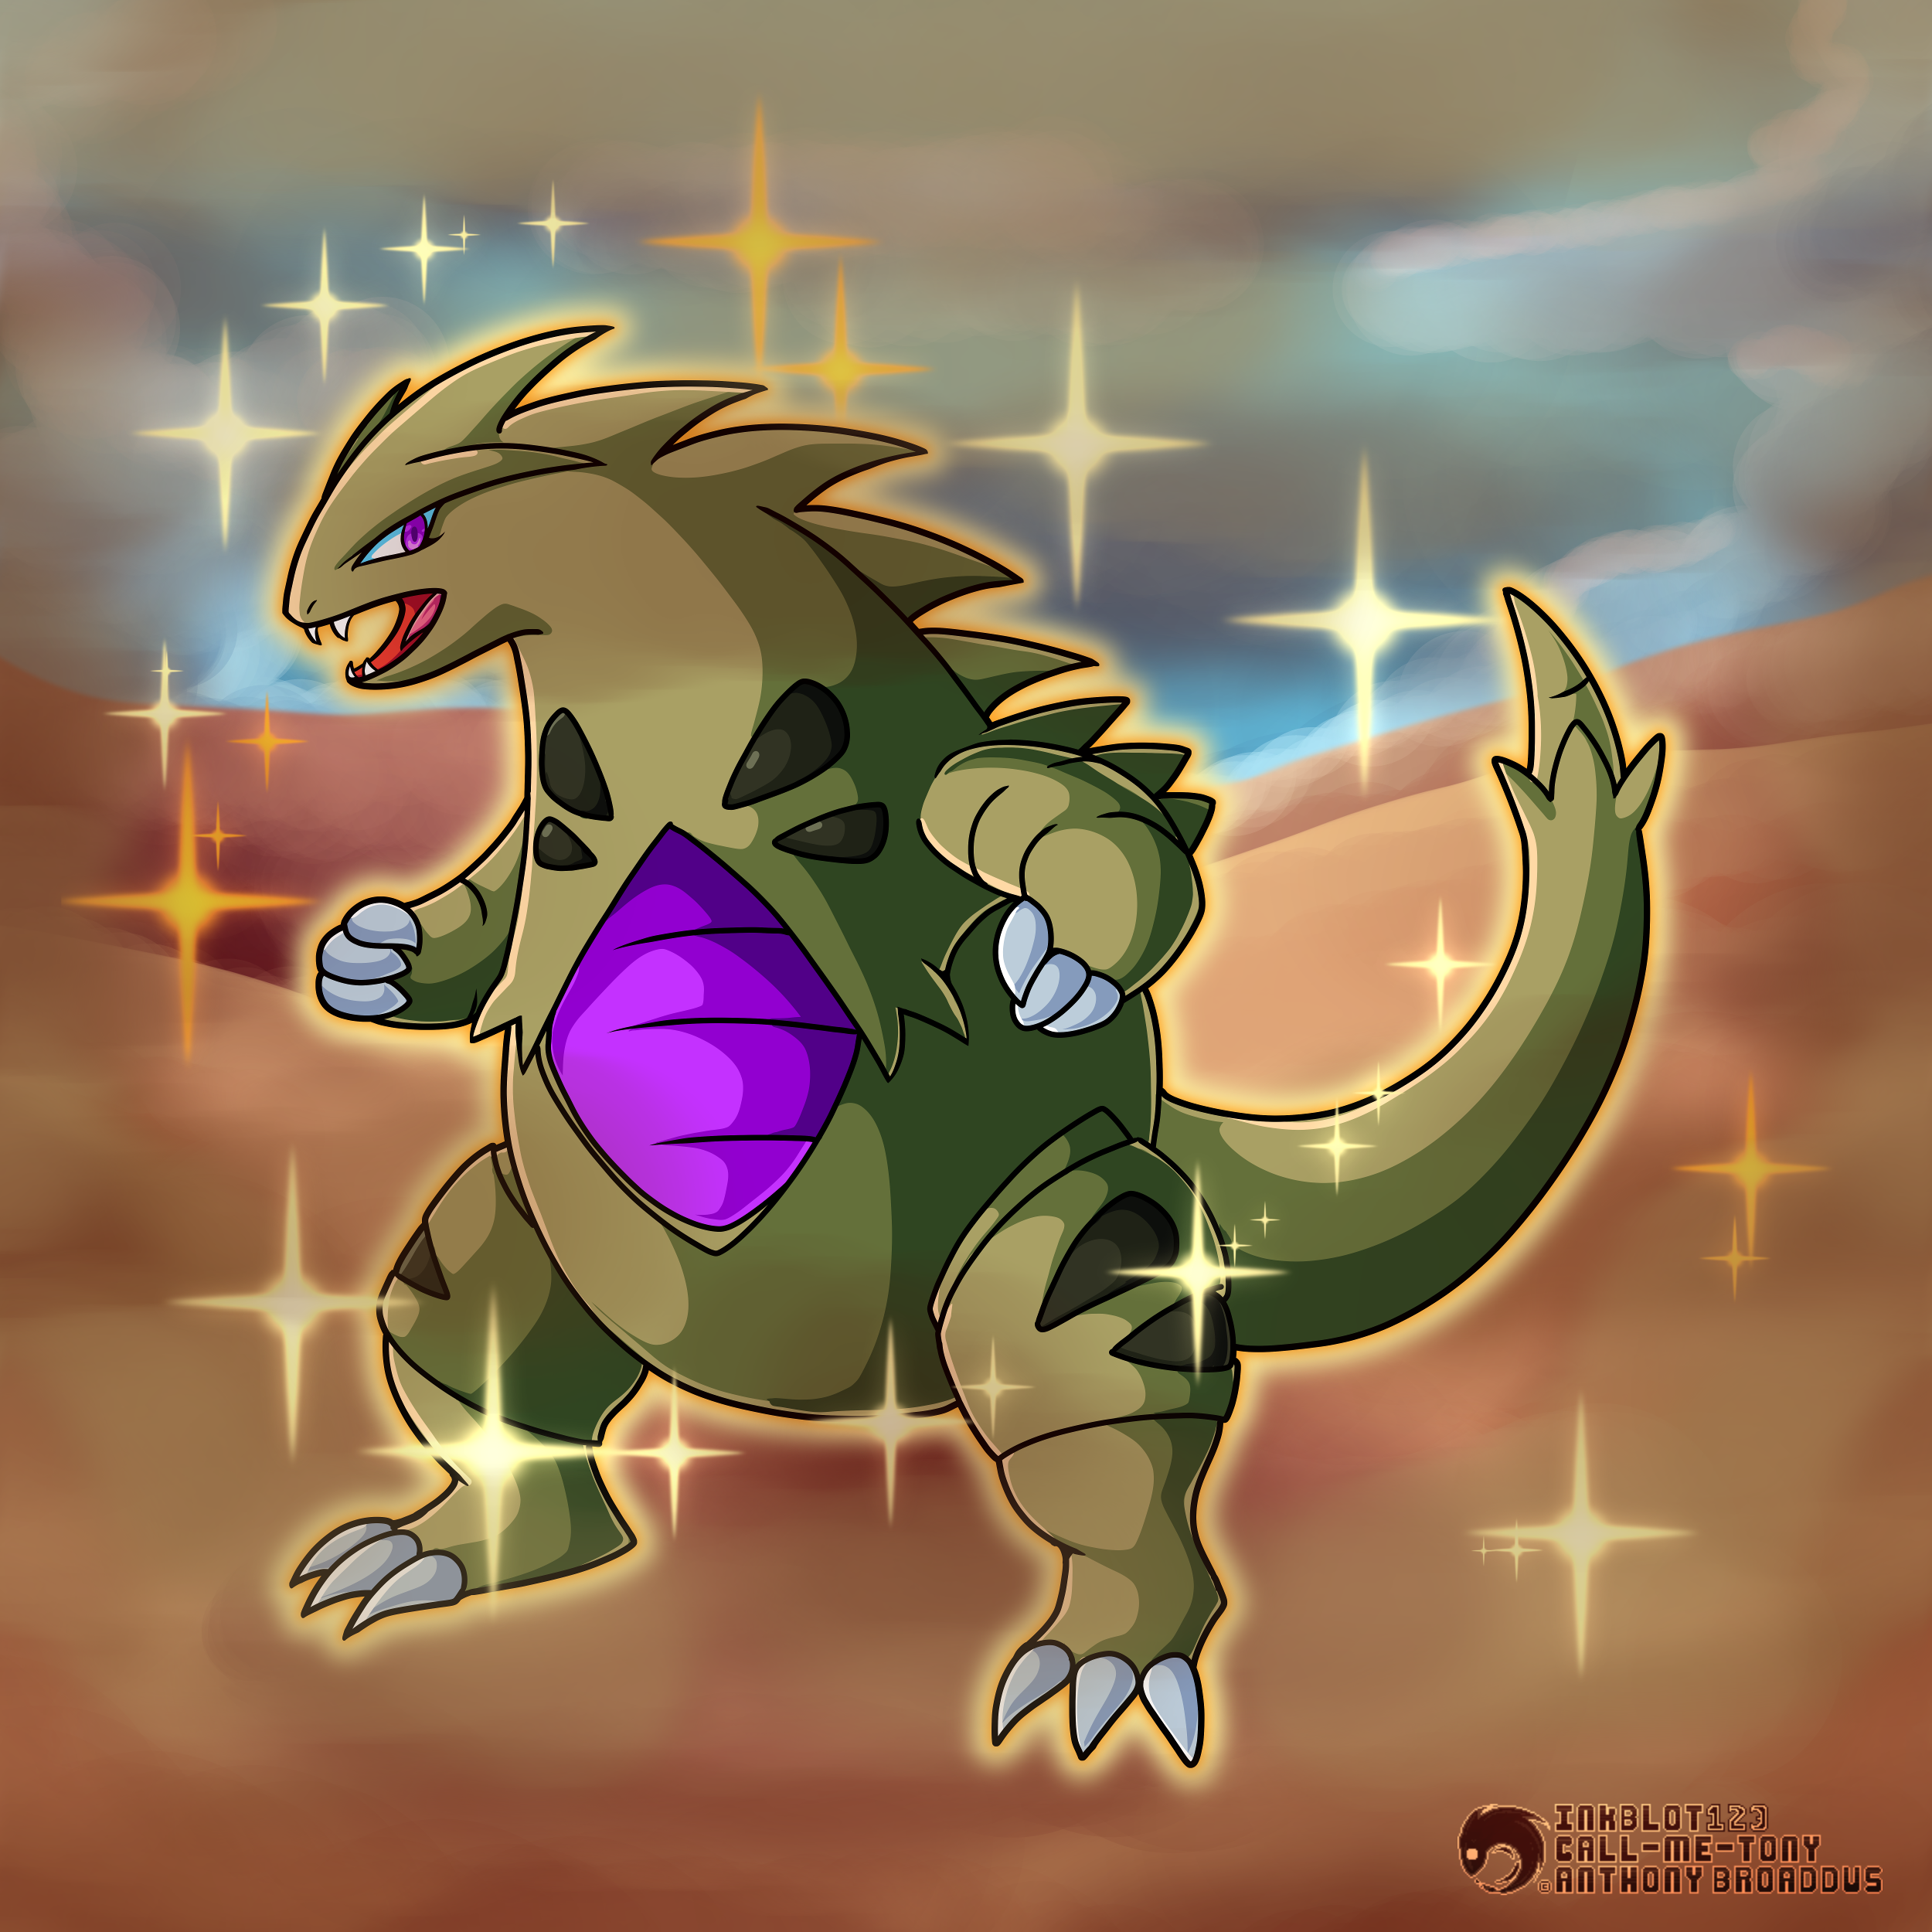 #248 - The Armor Pokemon - Tyranitar (Shiny) by ...